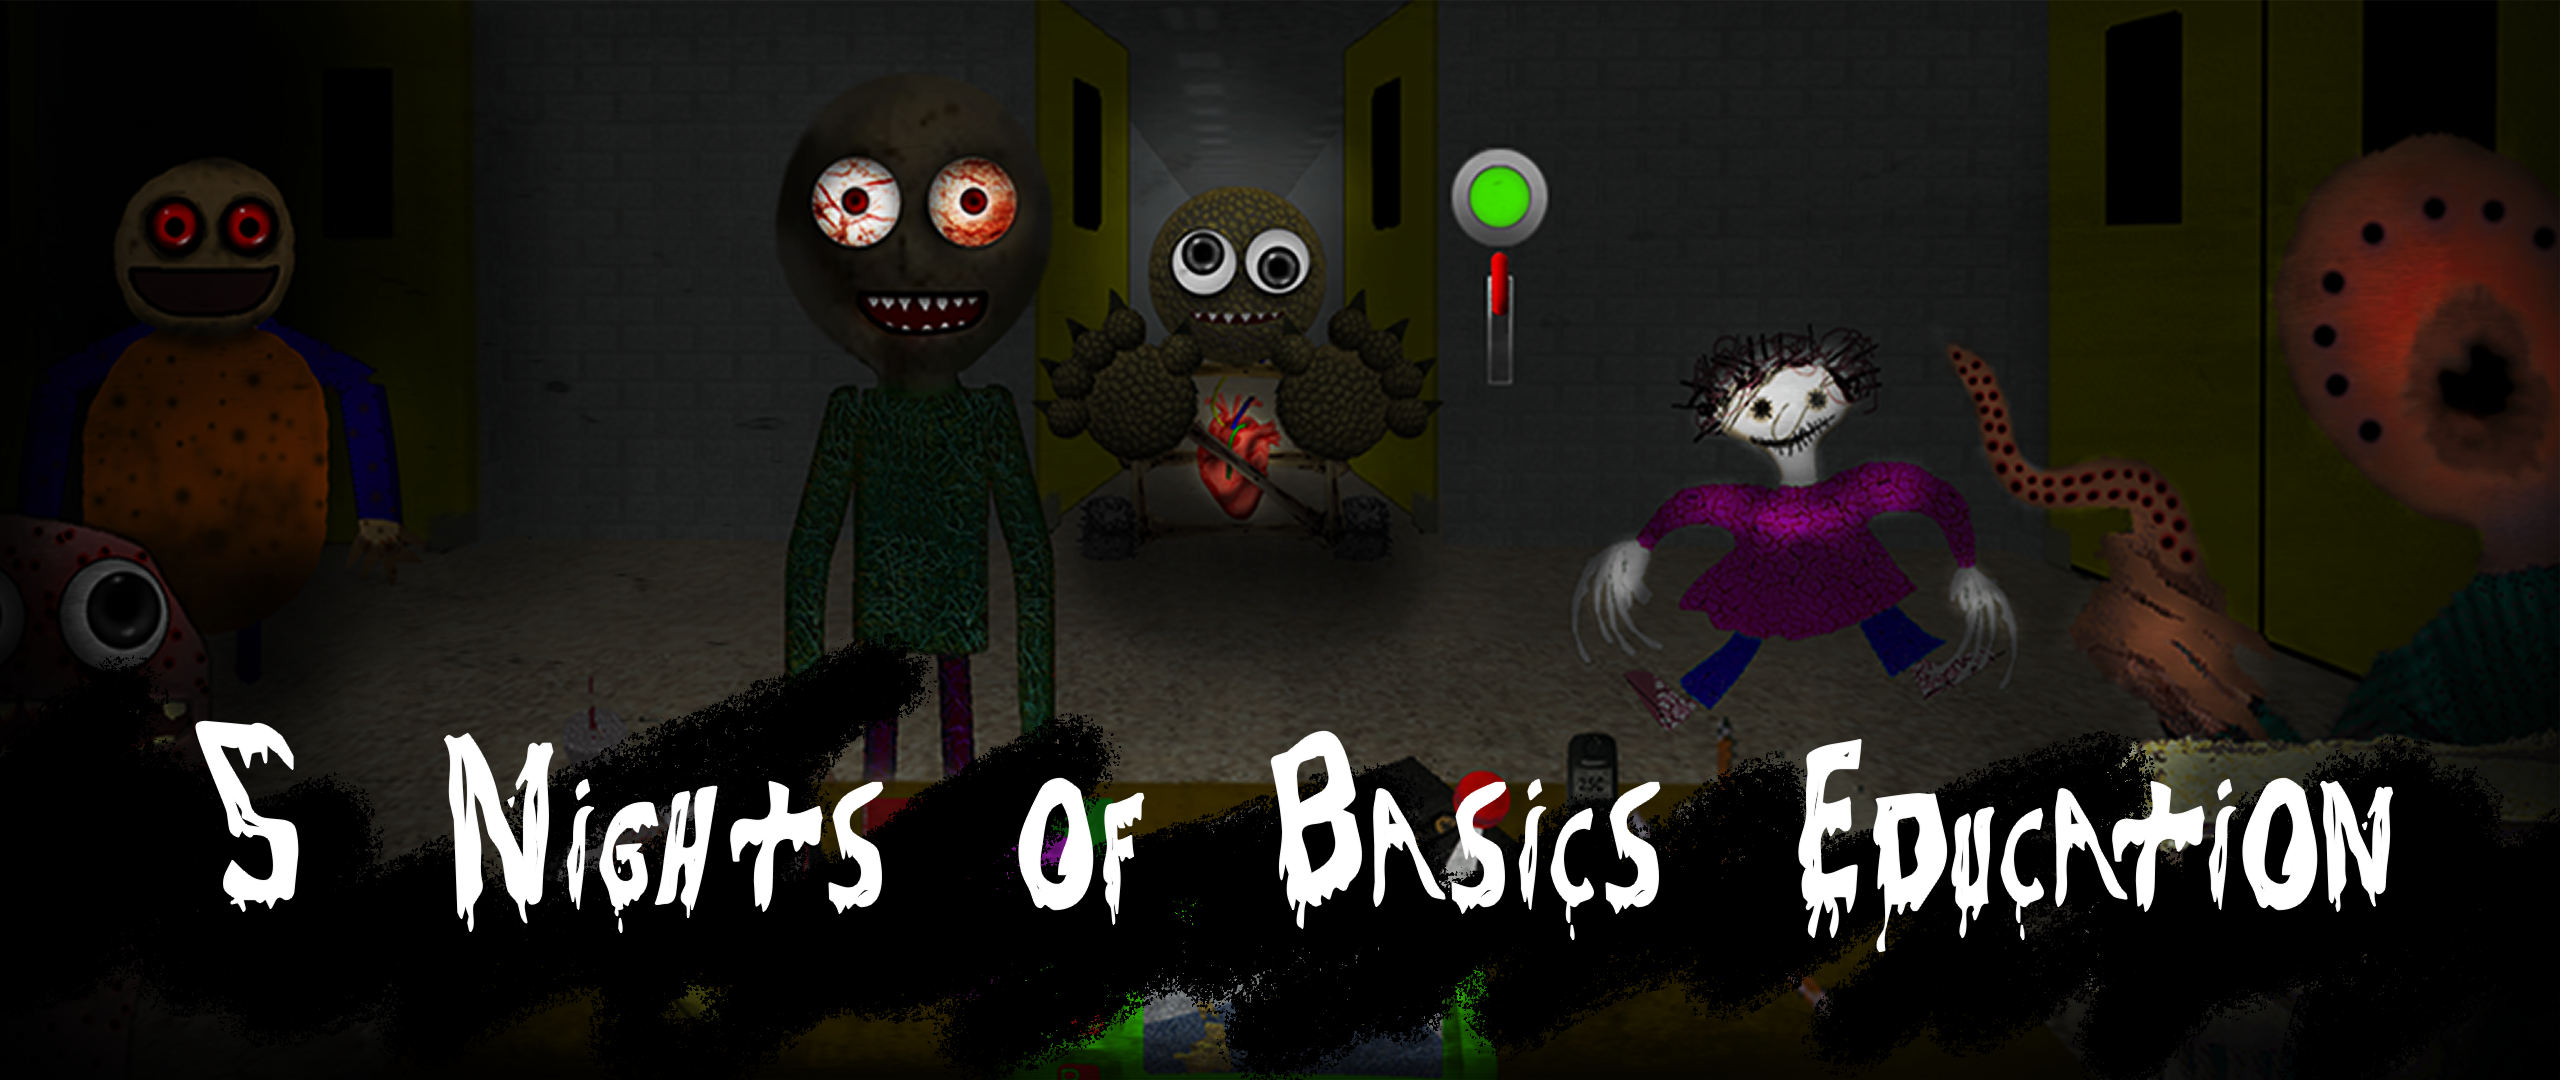 5 Nights of Basics Education